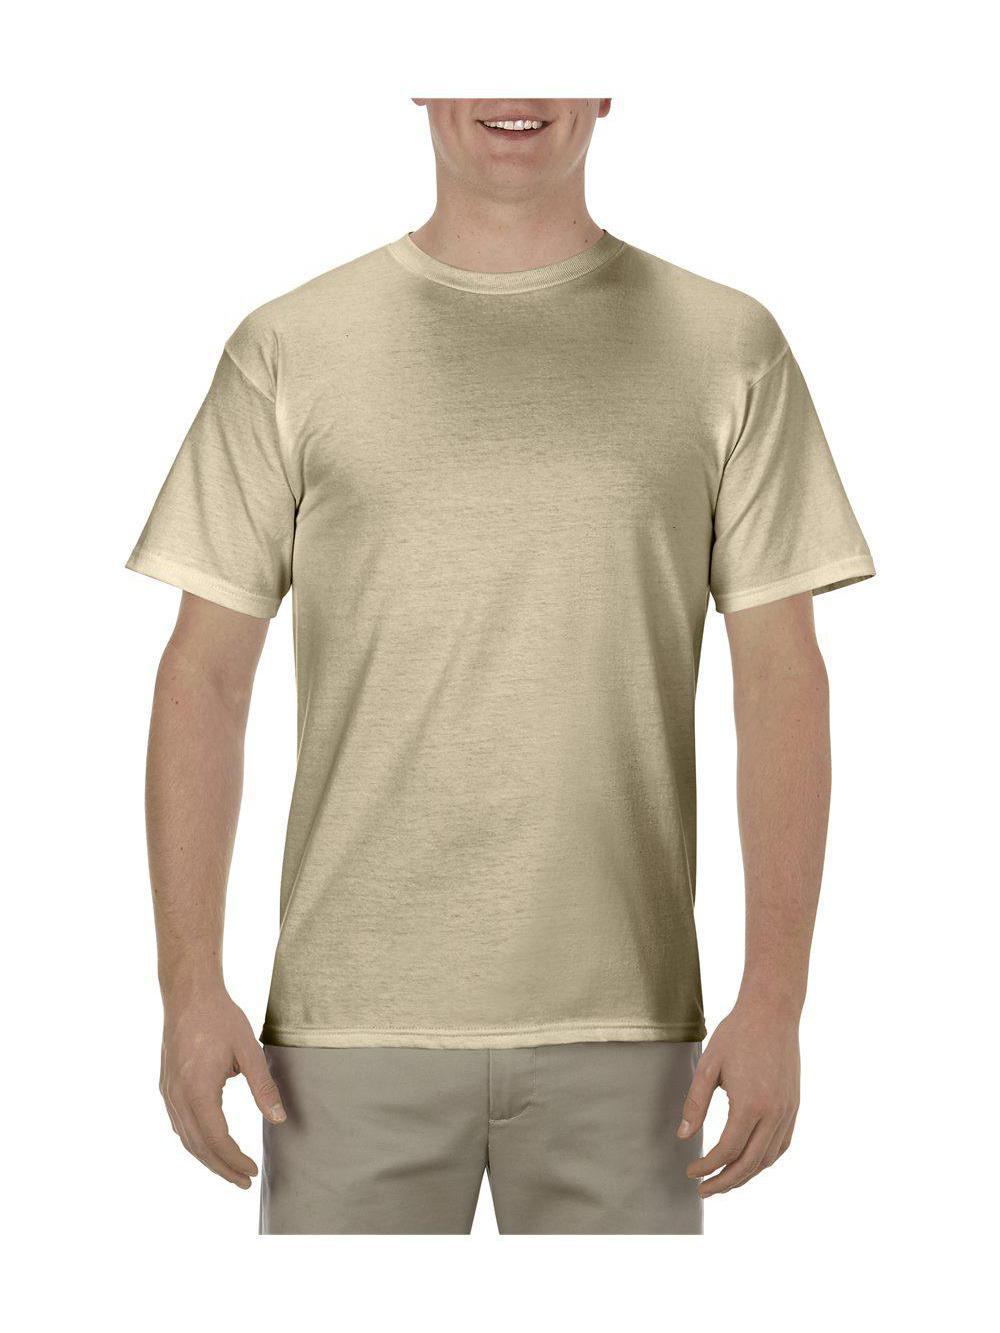 ALSTYLE-Premium-T-Shirt-1701 thumbnail 55